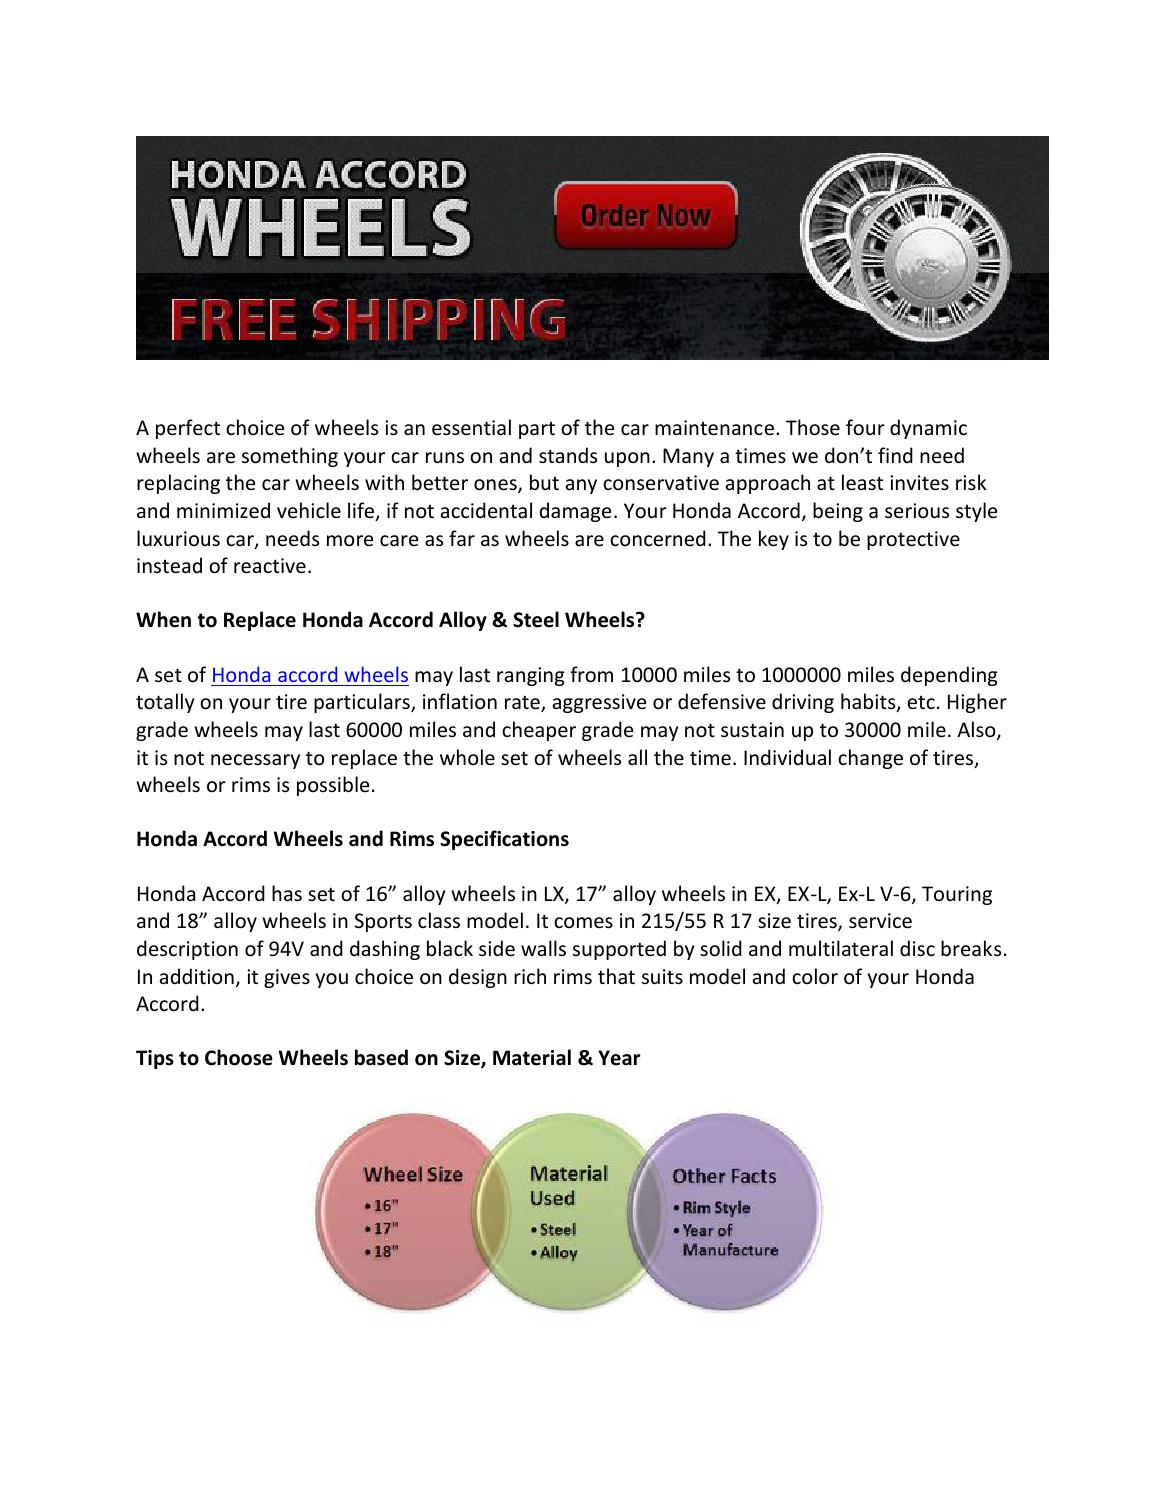 How to Choose Wheels for Honda Accord (Alloy Wheels, Steel Wheels & Rims)  by tapsprasad - issuu